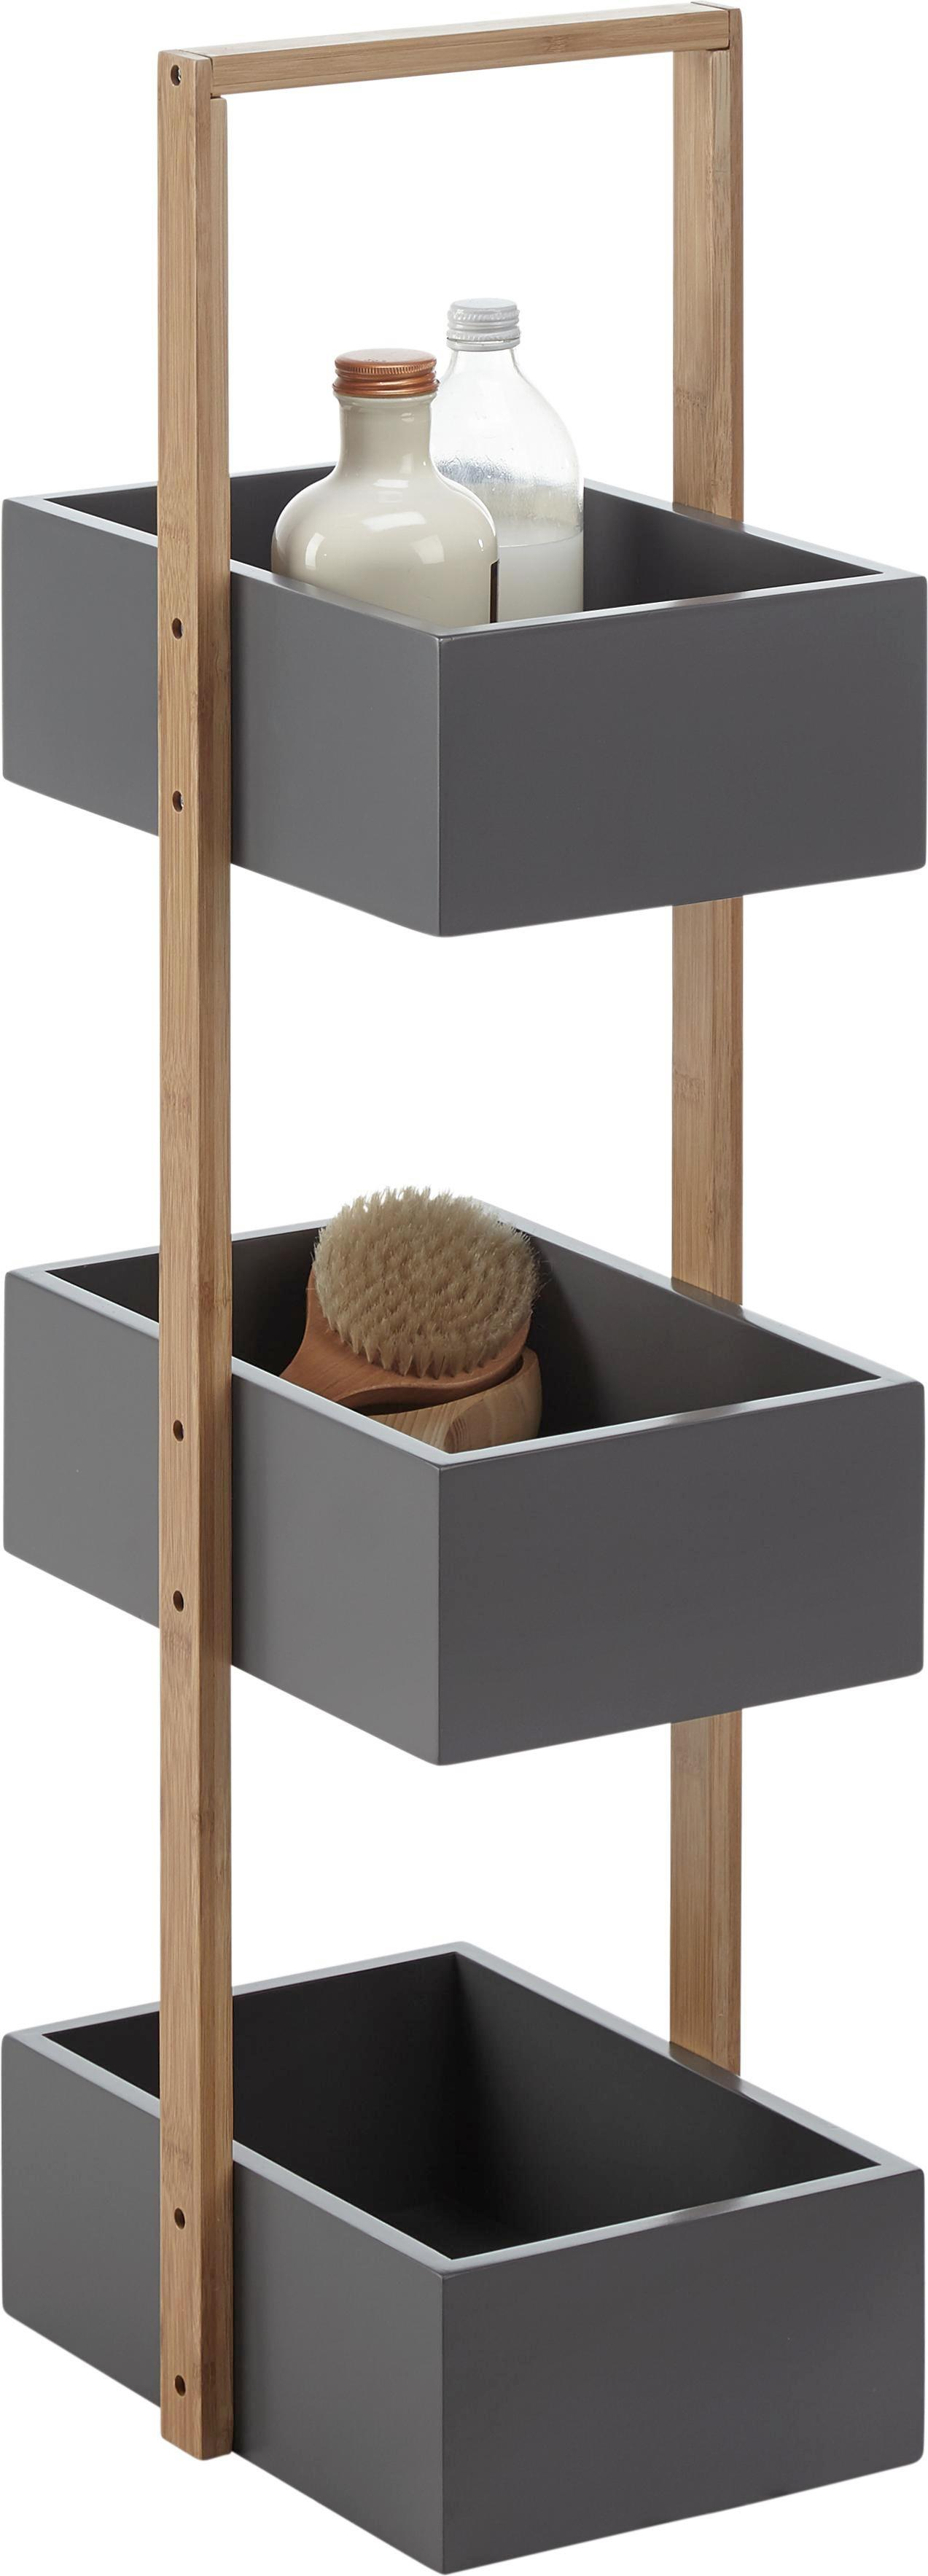 Badezimmerregal Mirella online kaufen ➤ mömax | {Badezimmer regal 18}